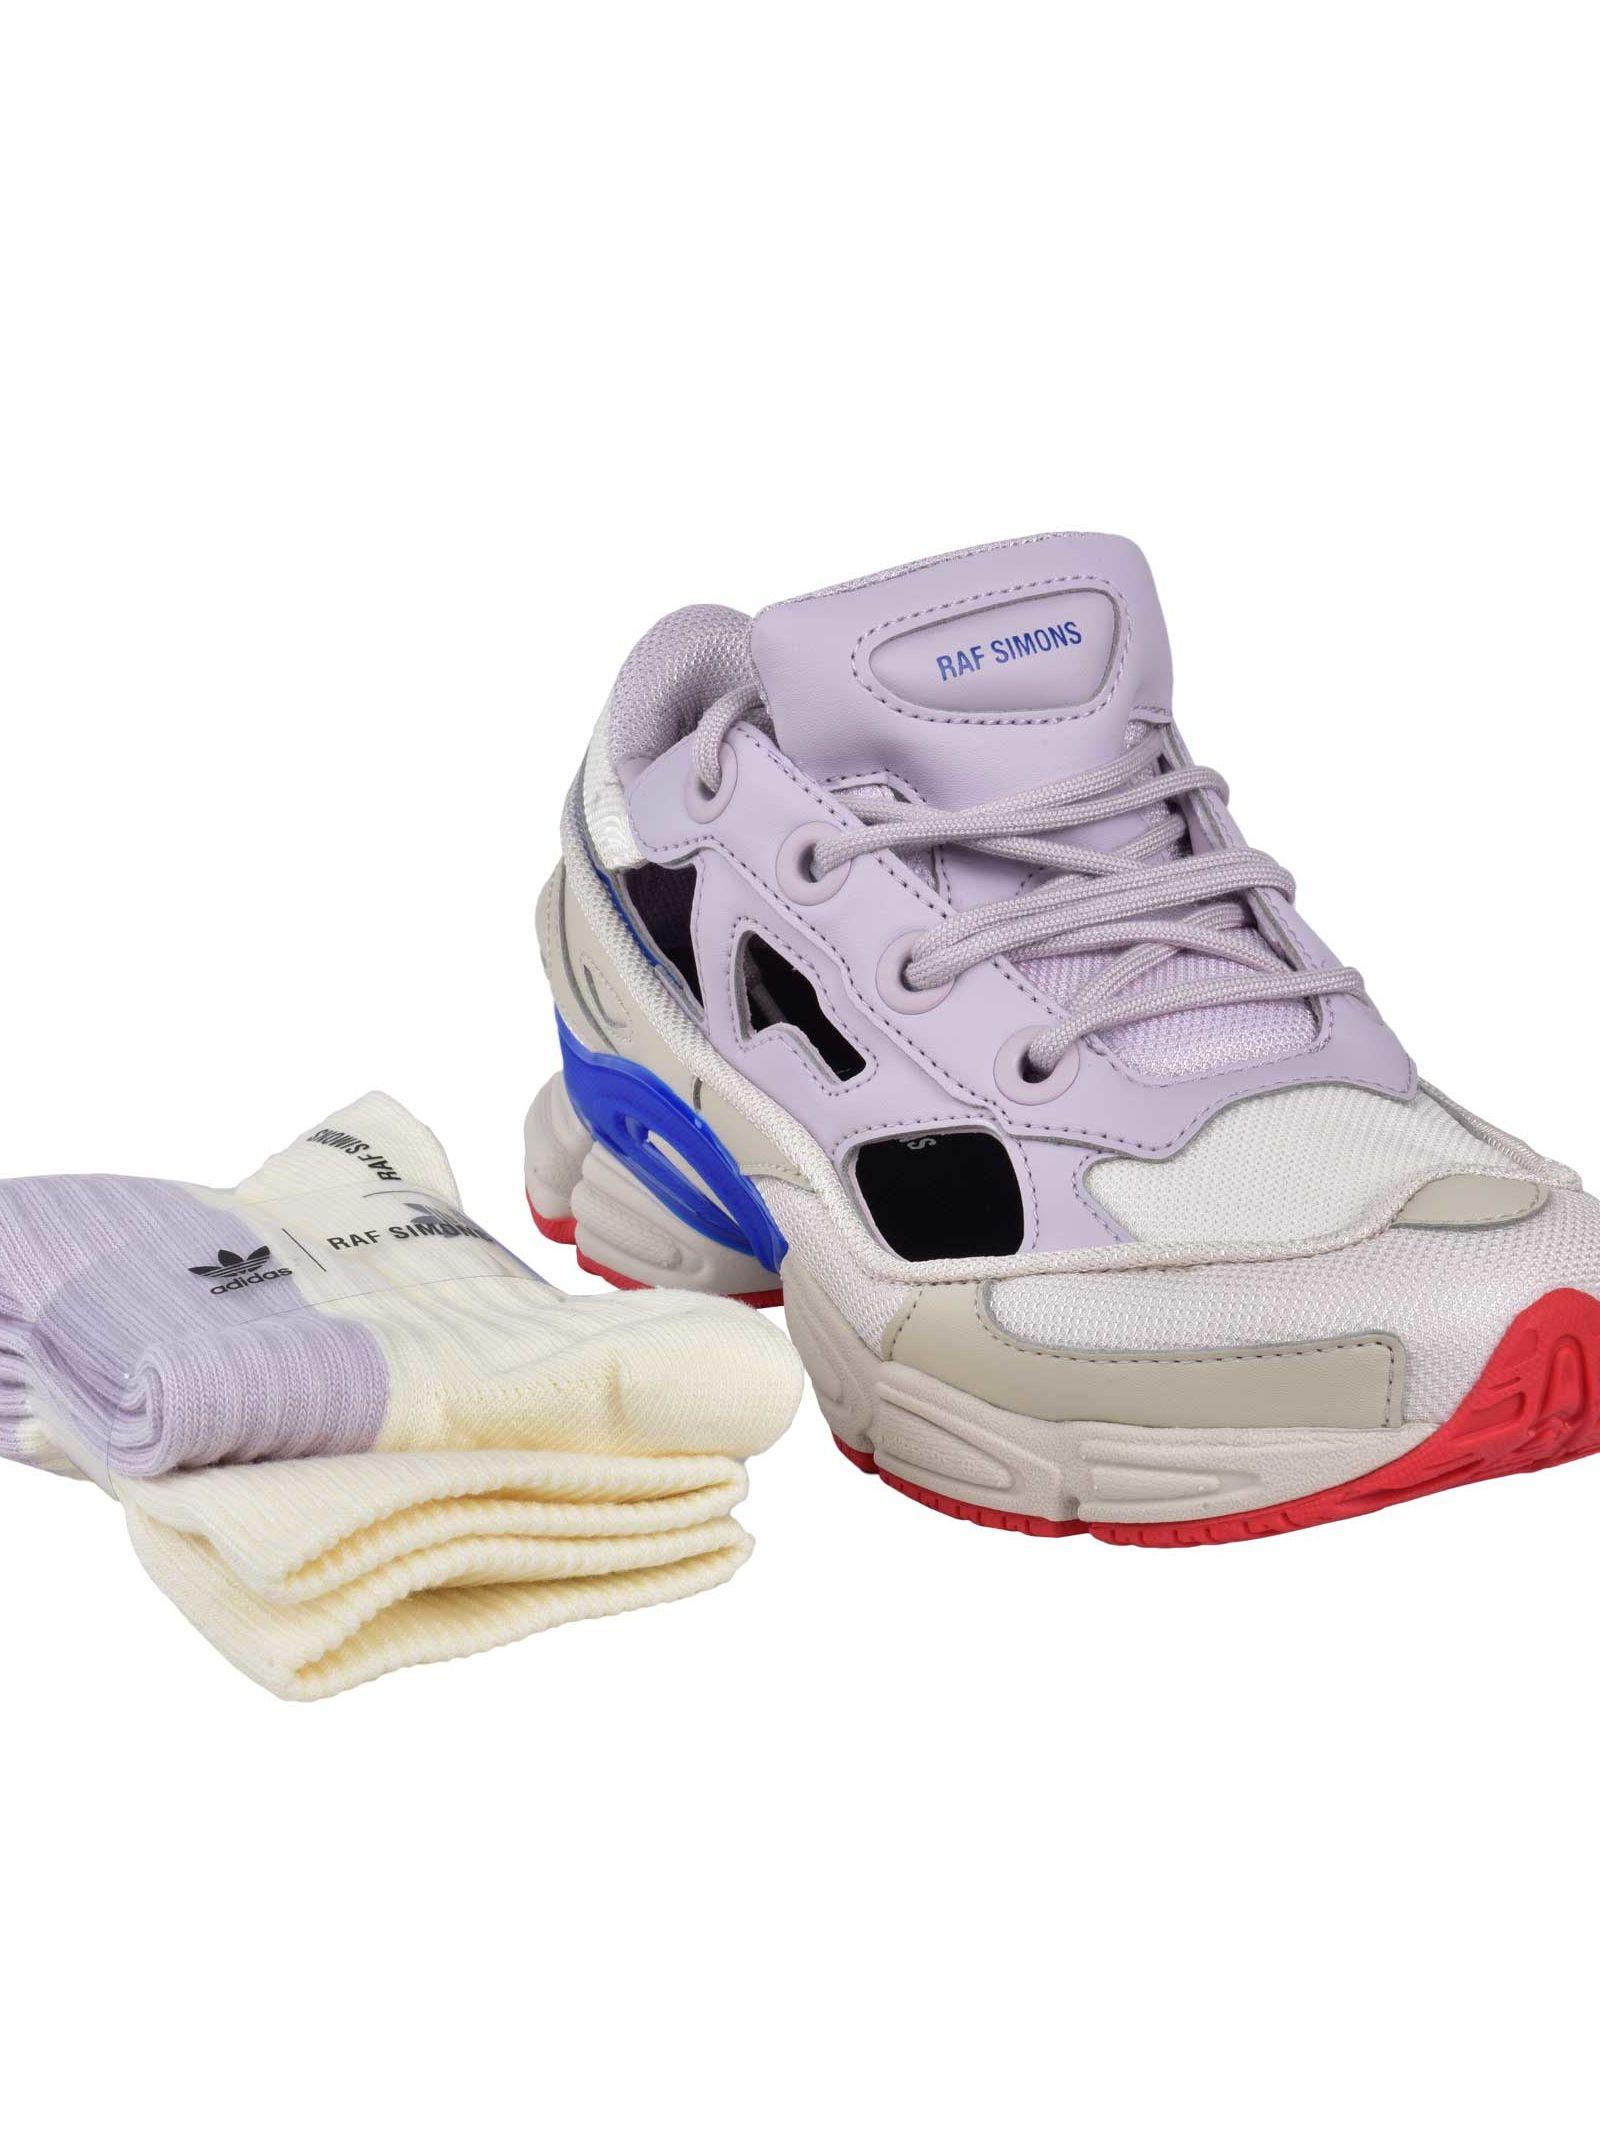 Adidas Raf Simons Ozweego Sneakers in Cbrown